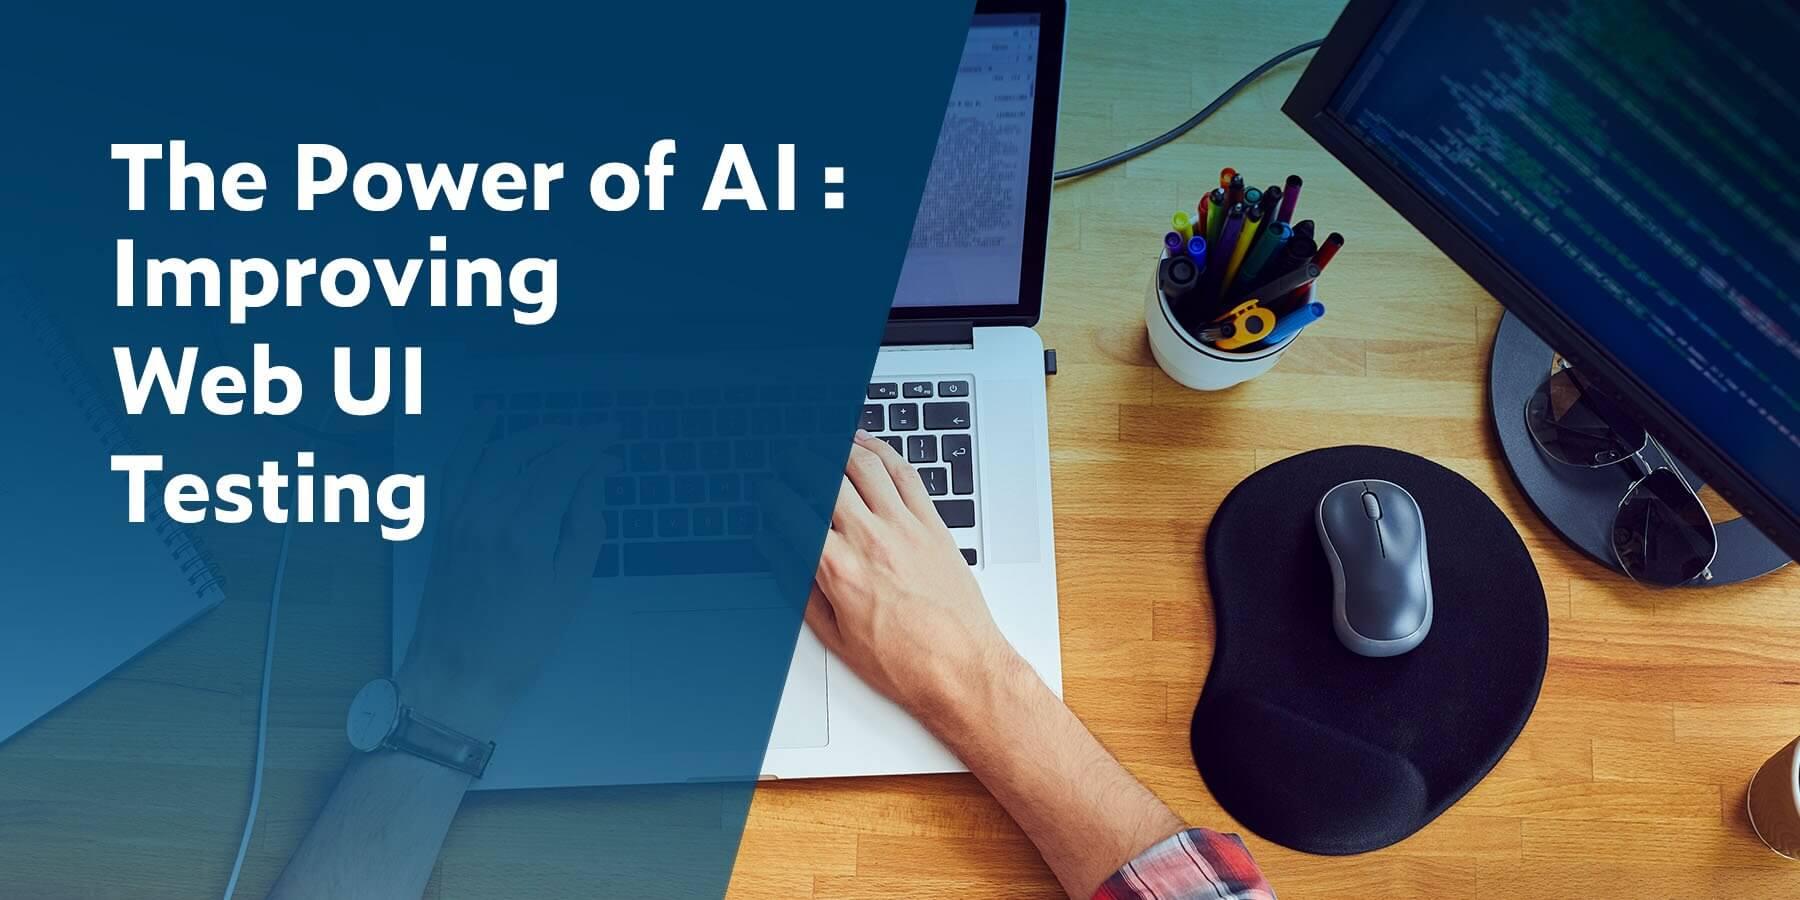 The Power of AI: Improving Web UI Testing